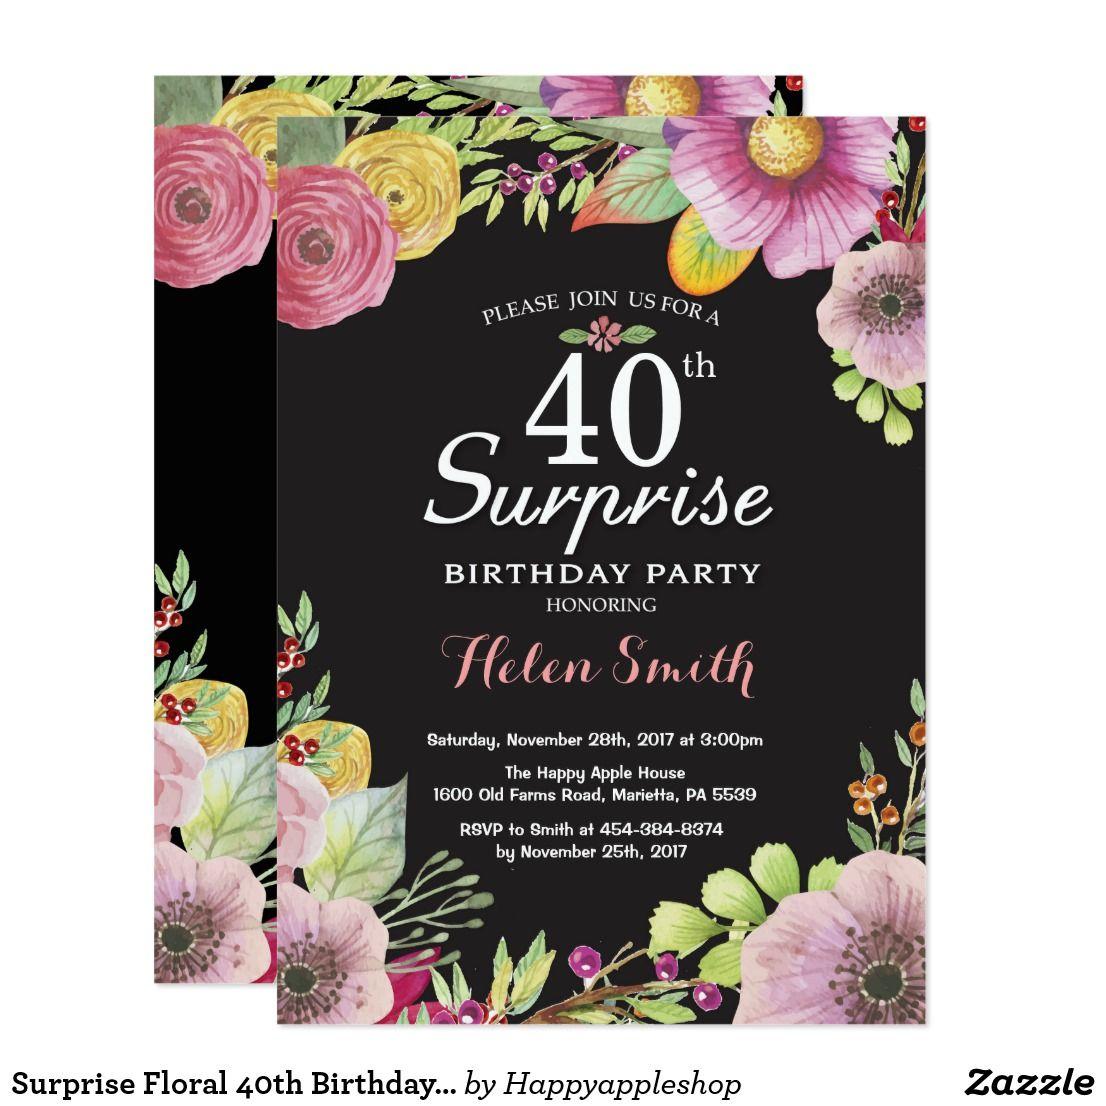 Surprise Floral 40th Birthday Invitation for Women | Pinterest | 40 ...